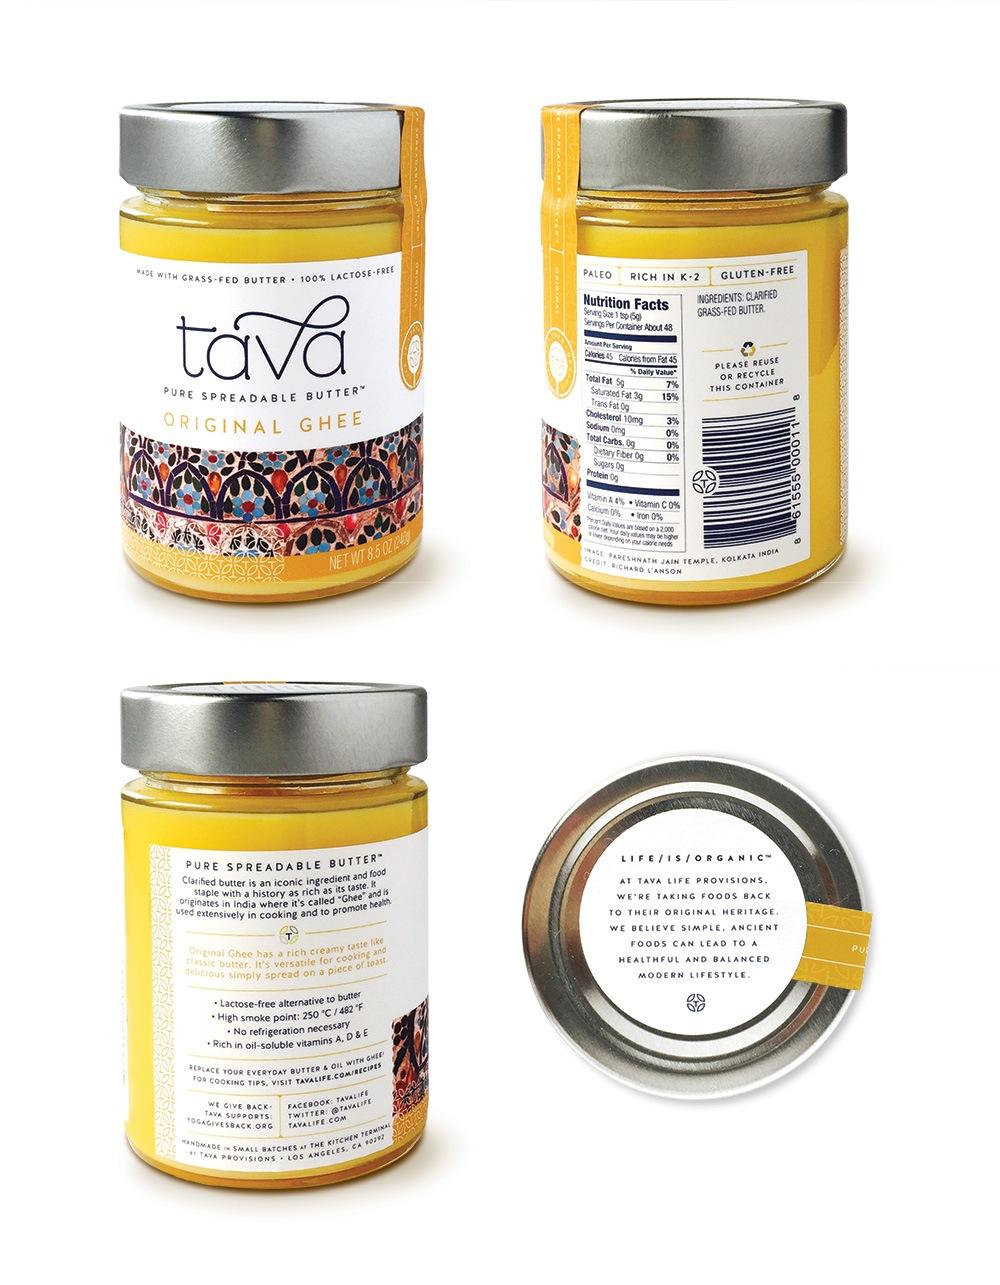 Tava Jars - Alternate Views Packaging Design